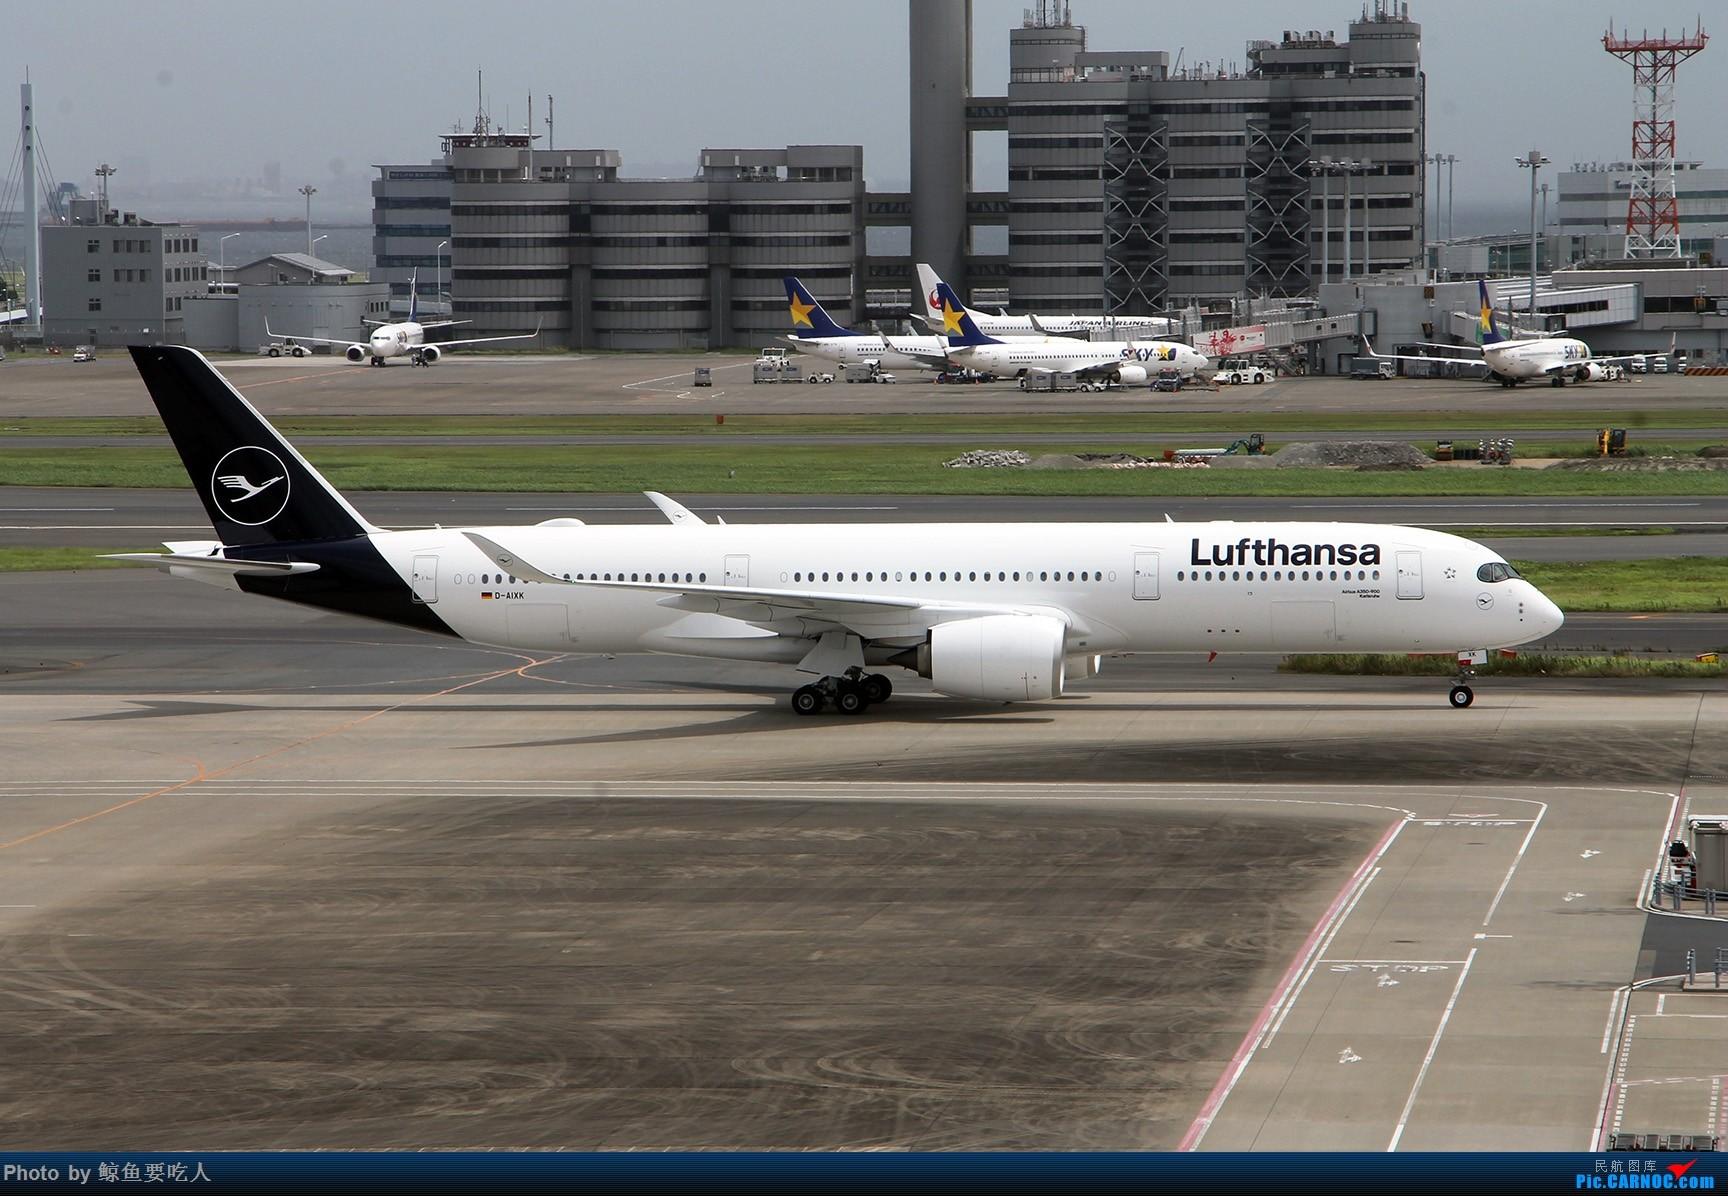 Re: 德国汉莎航空 A350-900 新涂装 在东京羽田国际机场 AIRBUS A350-900 D-AIXK 东京羽田国际机场